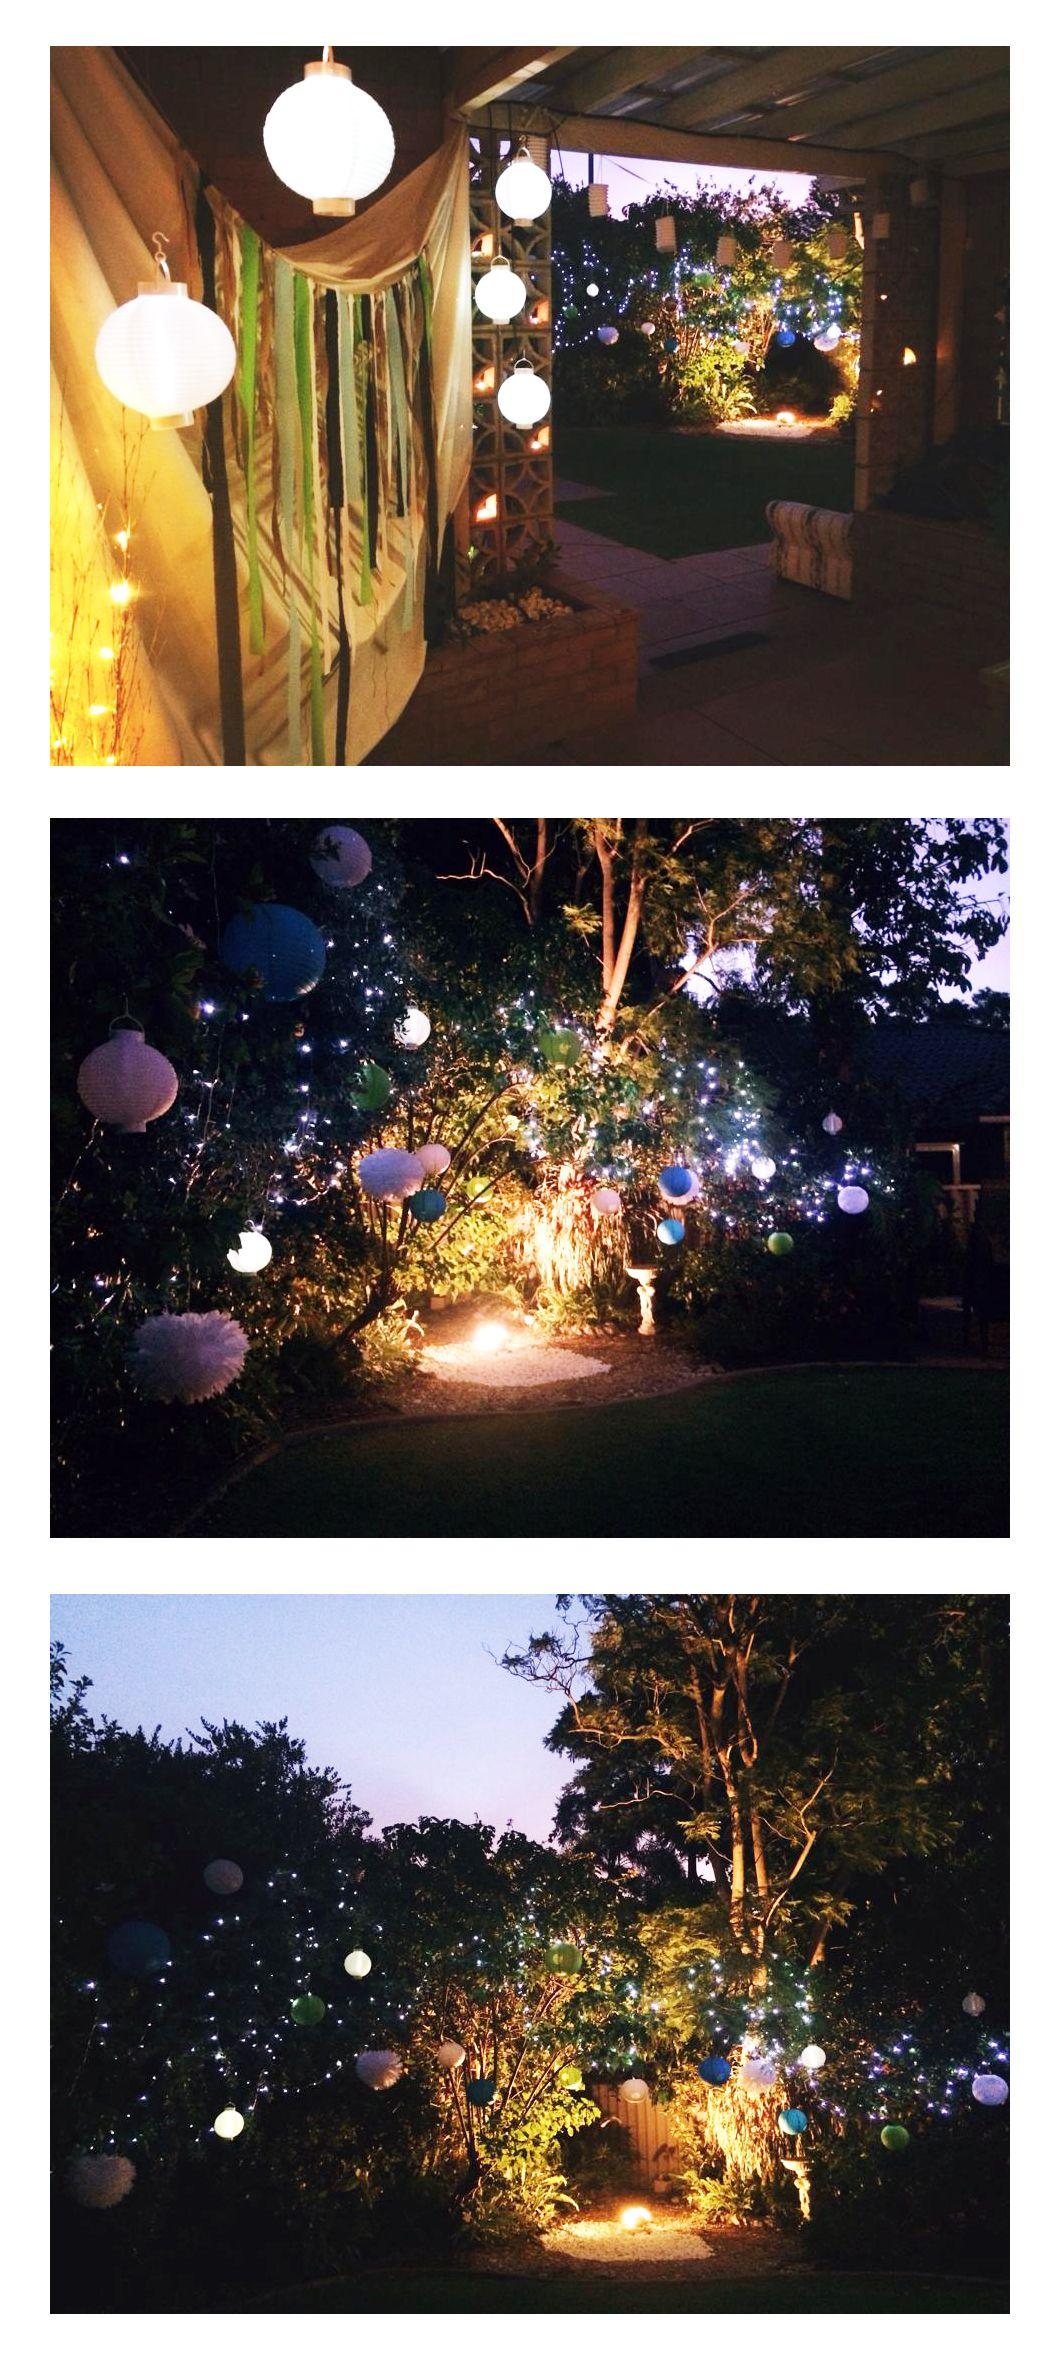 My 21st Birthday, Decorations, Fairy Lights, Paper Lanterns, Flood Light, Backyard, Garden, Party, Night, Lights #21stbirthdaydecorations